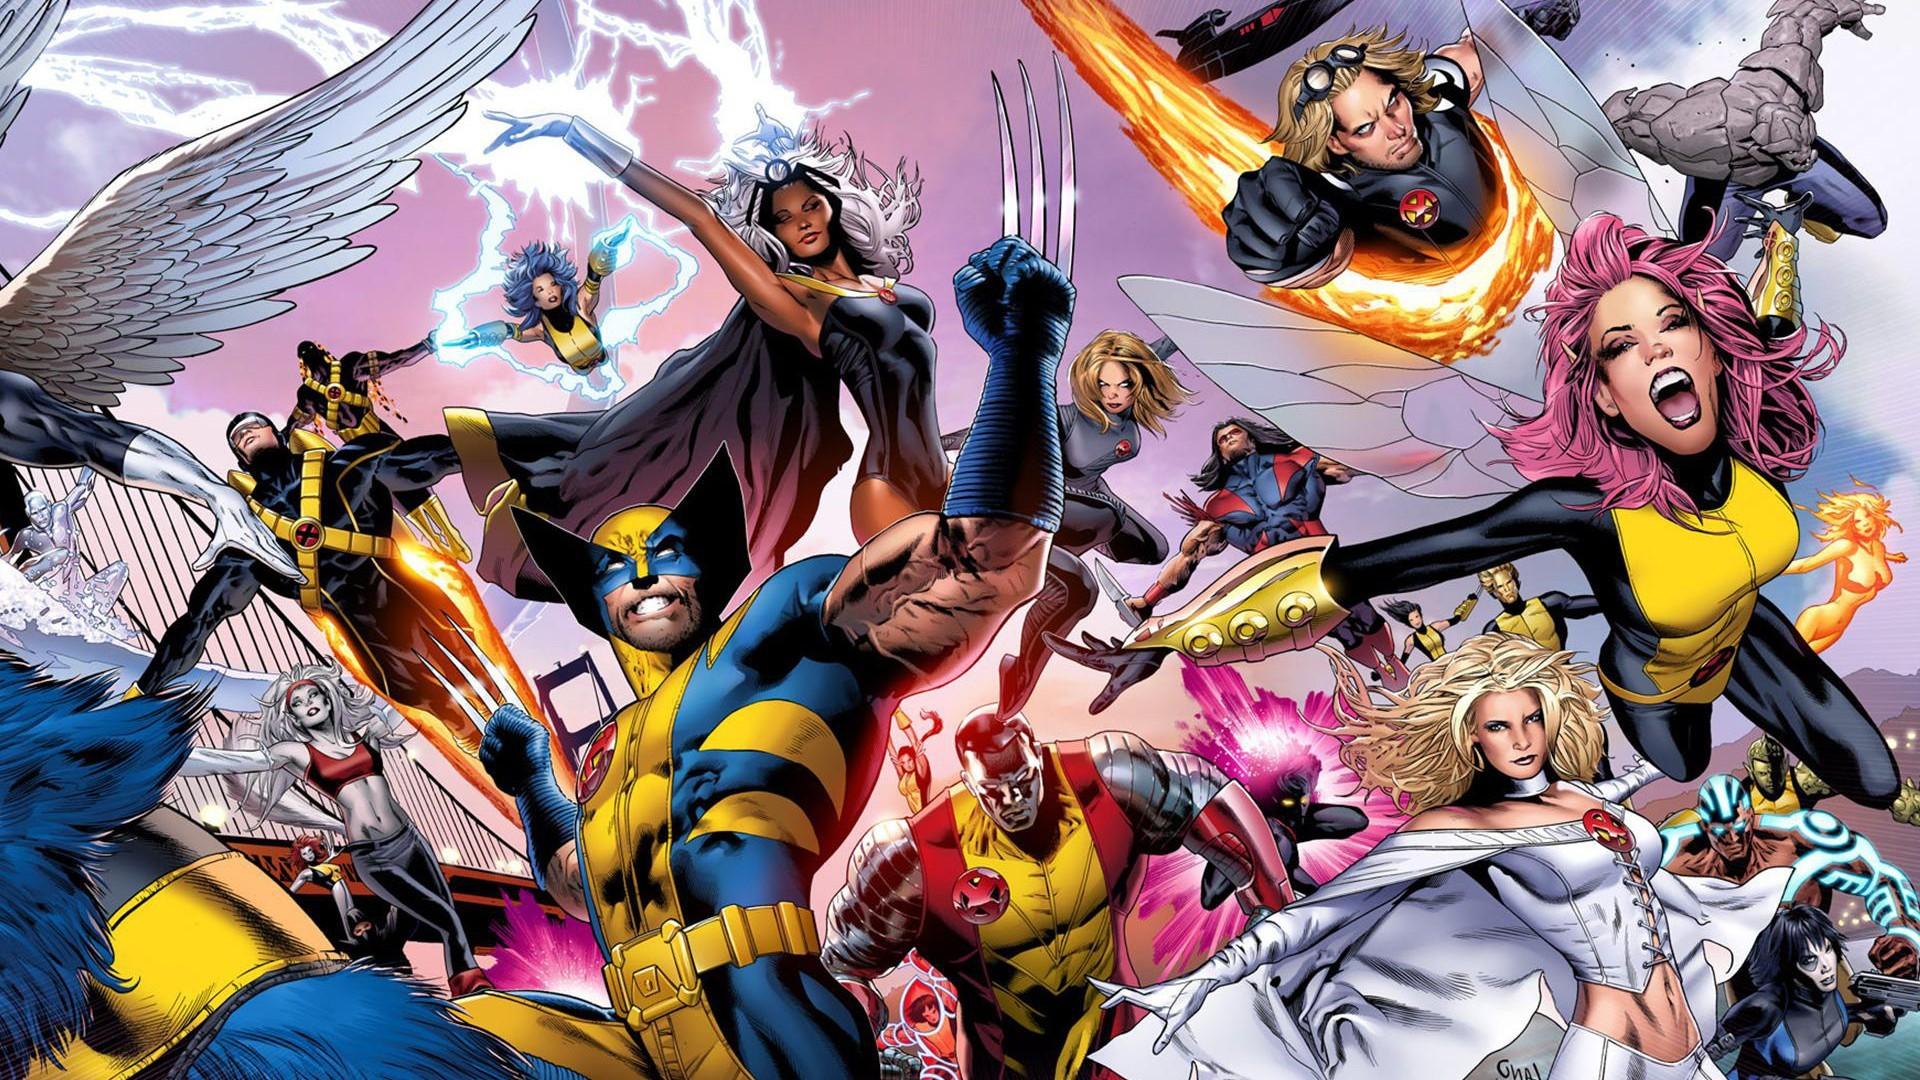 Storm X Men Wallpaper 63 Images: Xmen Wallpapers